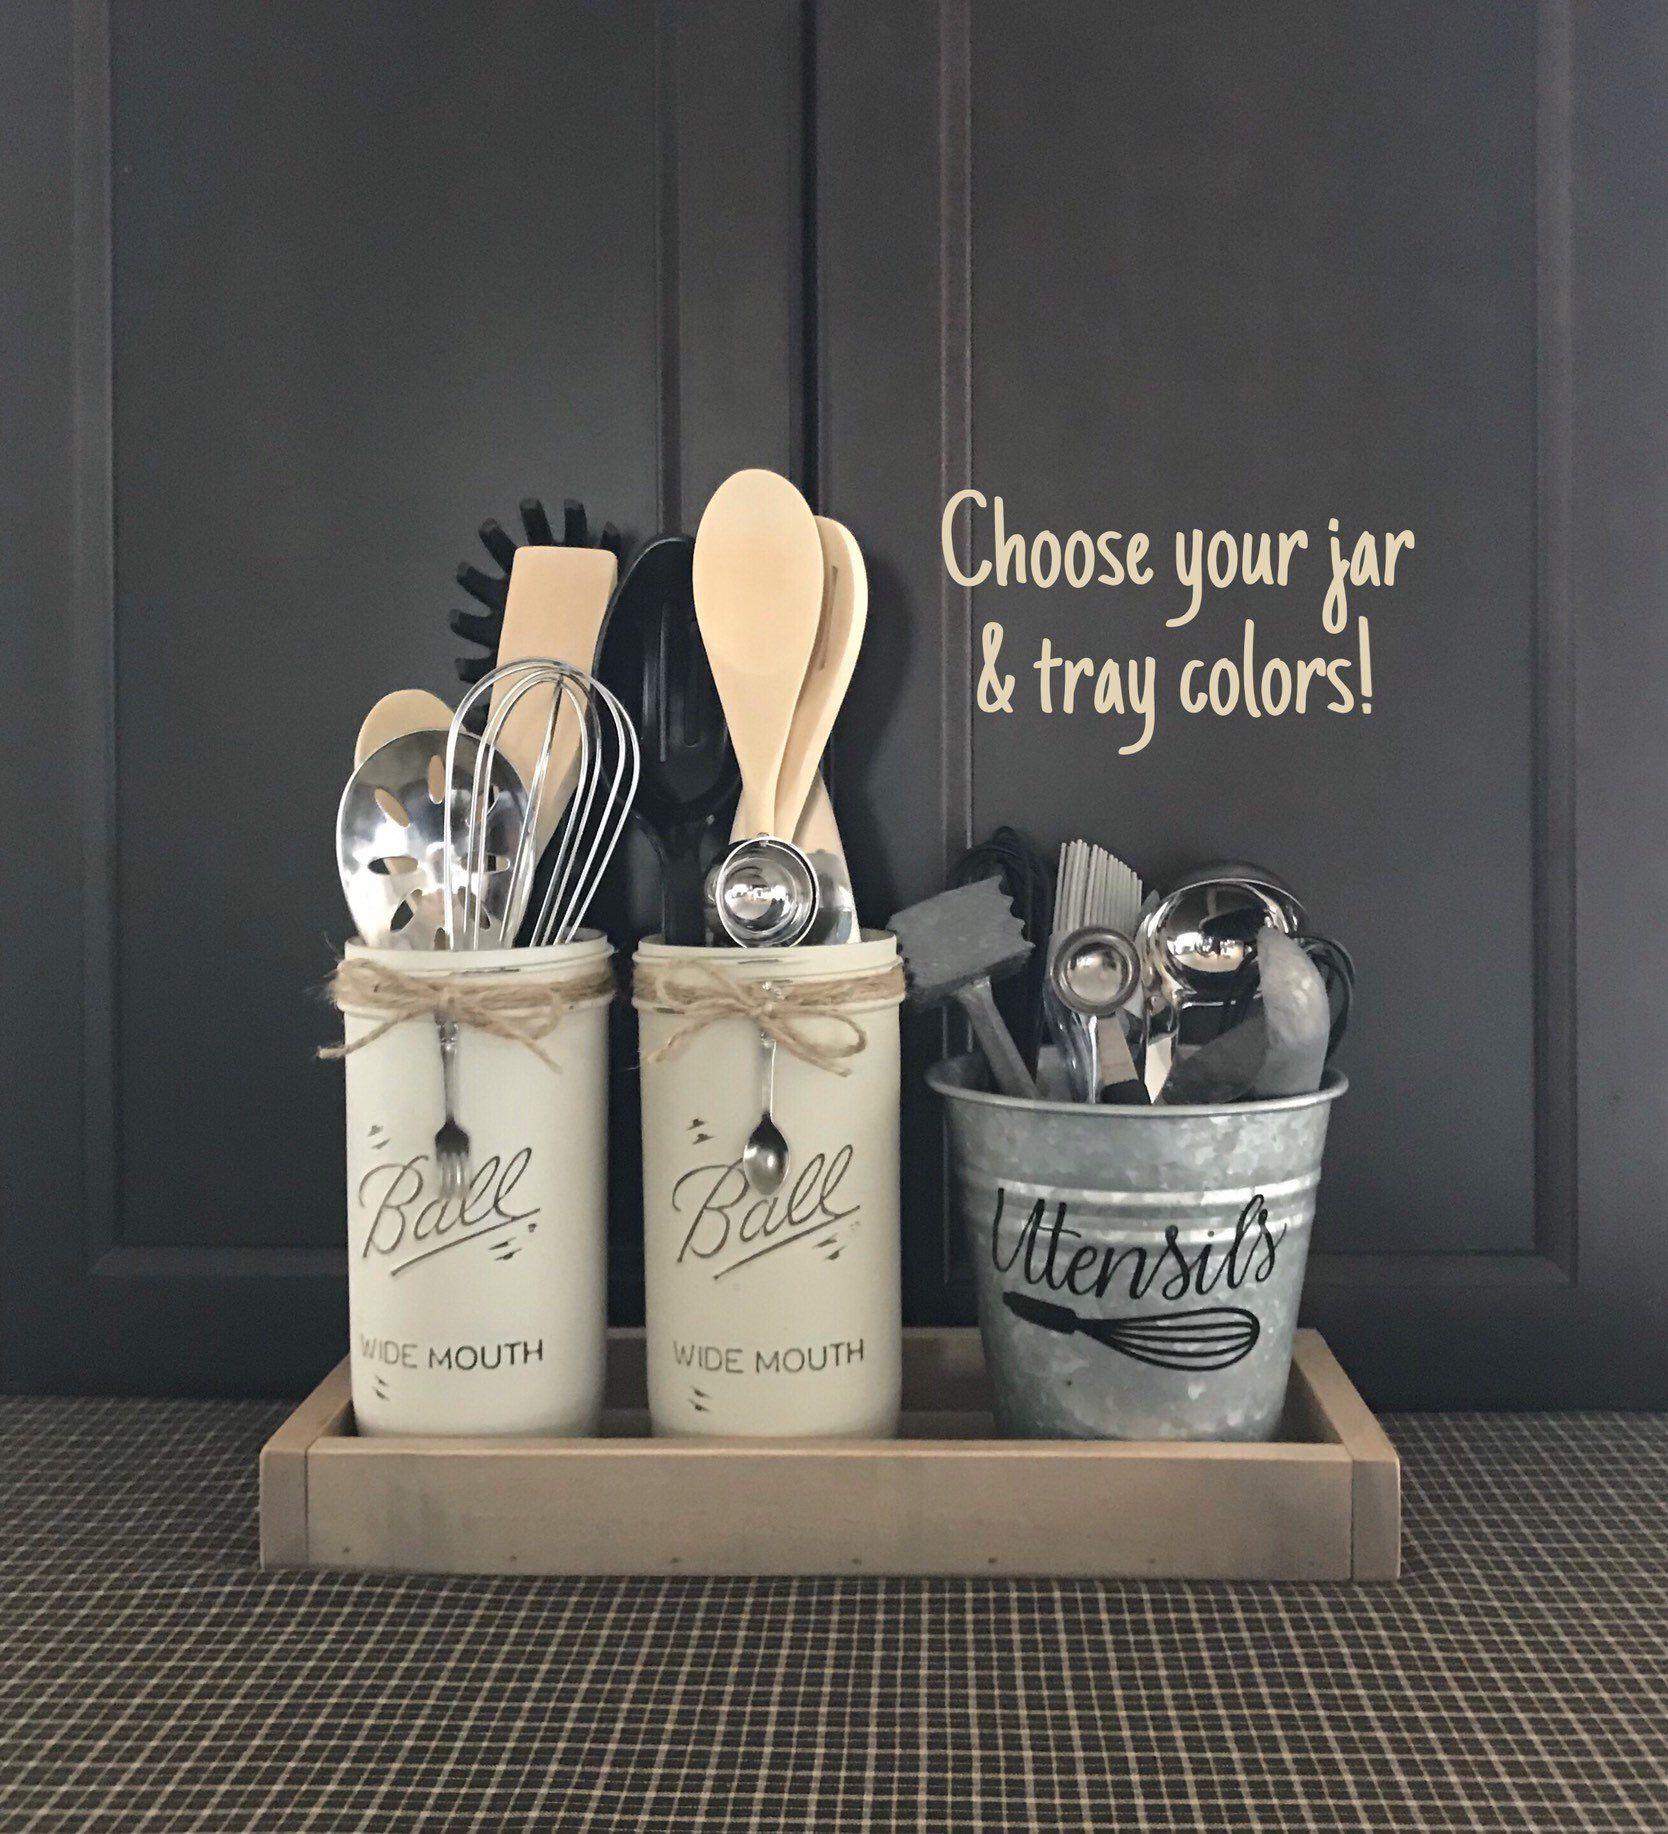 Kitchen Utensil Holder, Rustic Kitchen Decor, Modern Farmhouse Decor, Utensils Caddy, Mason Jar Decor, Rustic Home Decor, Country Home Decor images